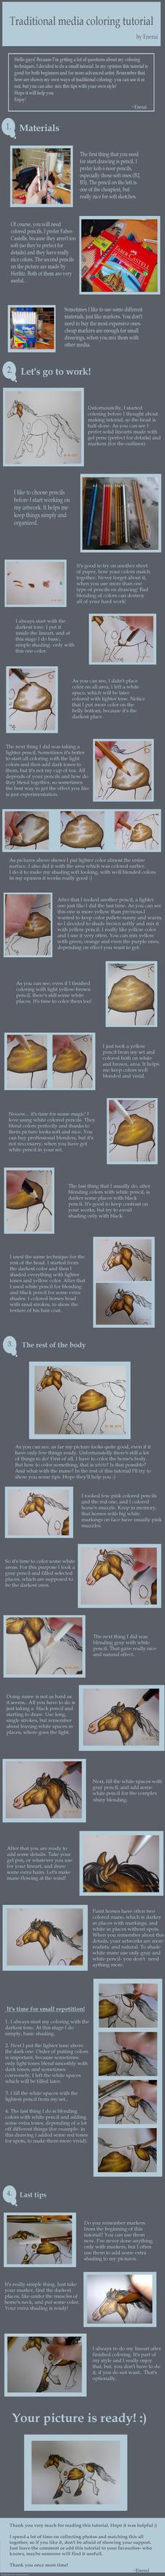 Traditional media coloring tutorial by enerai